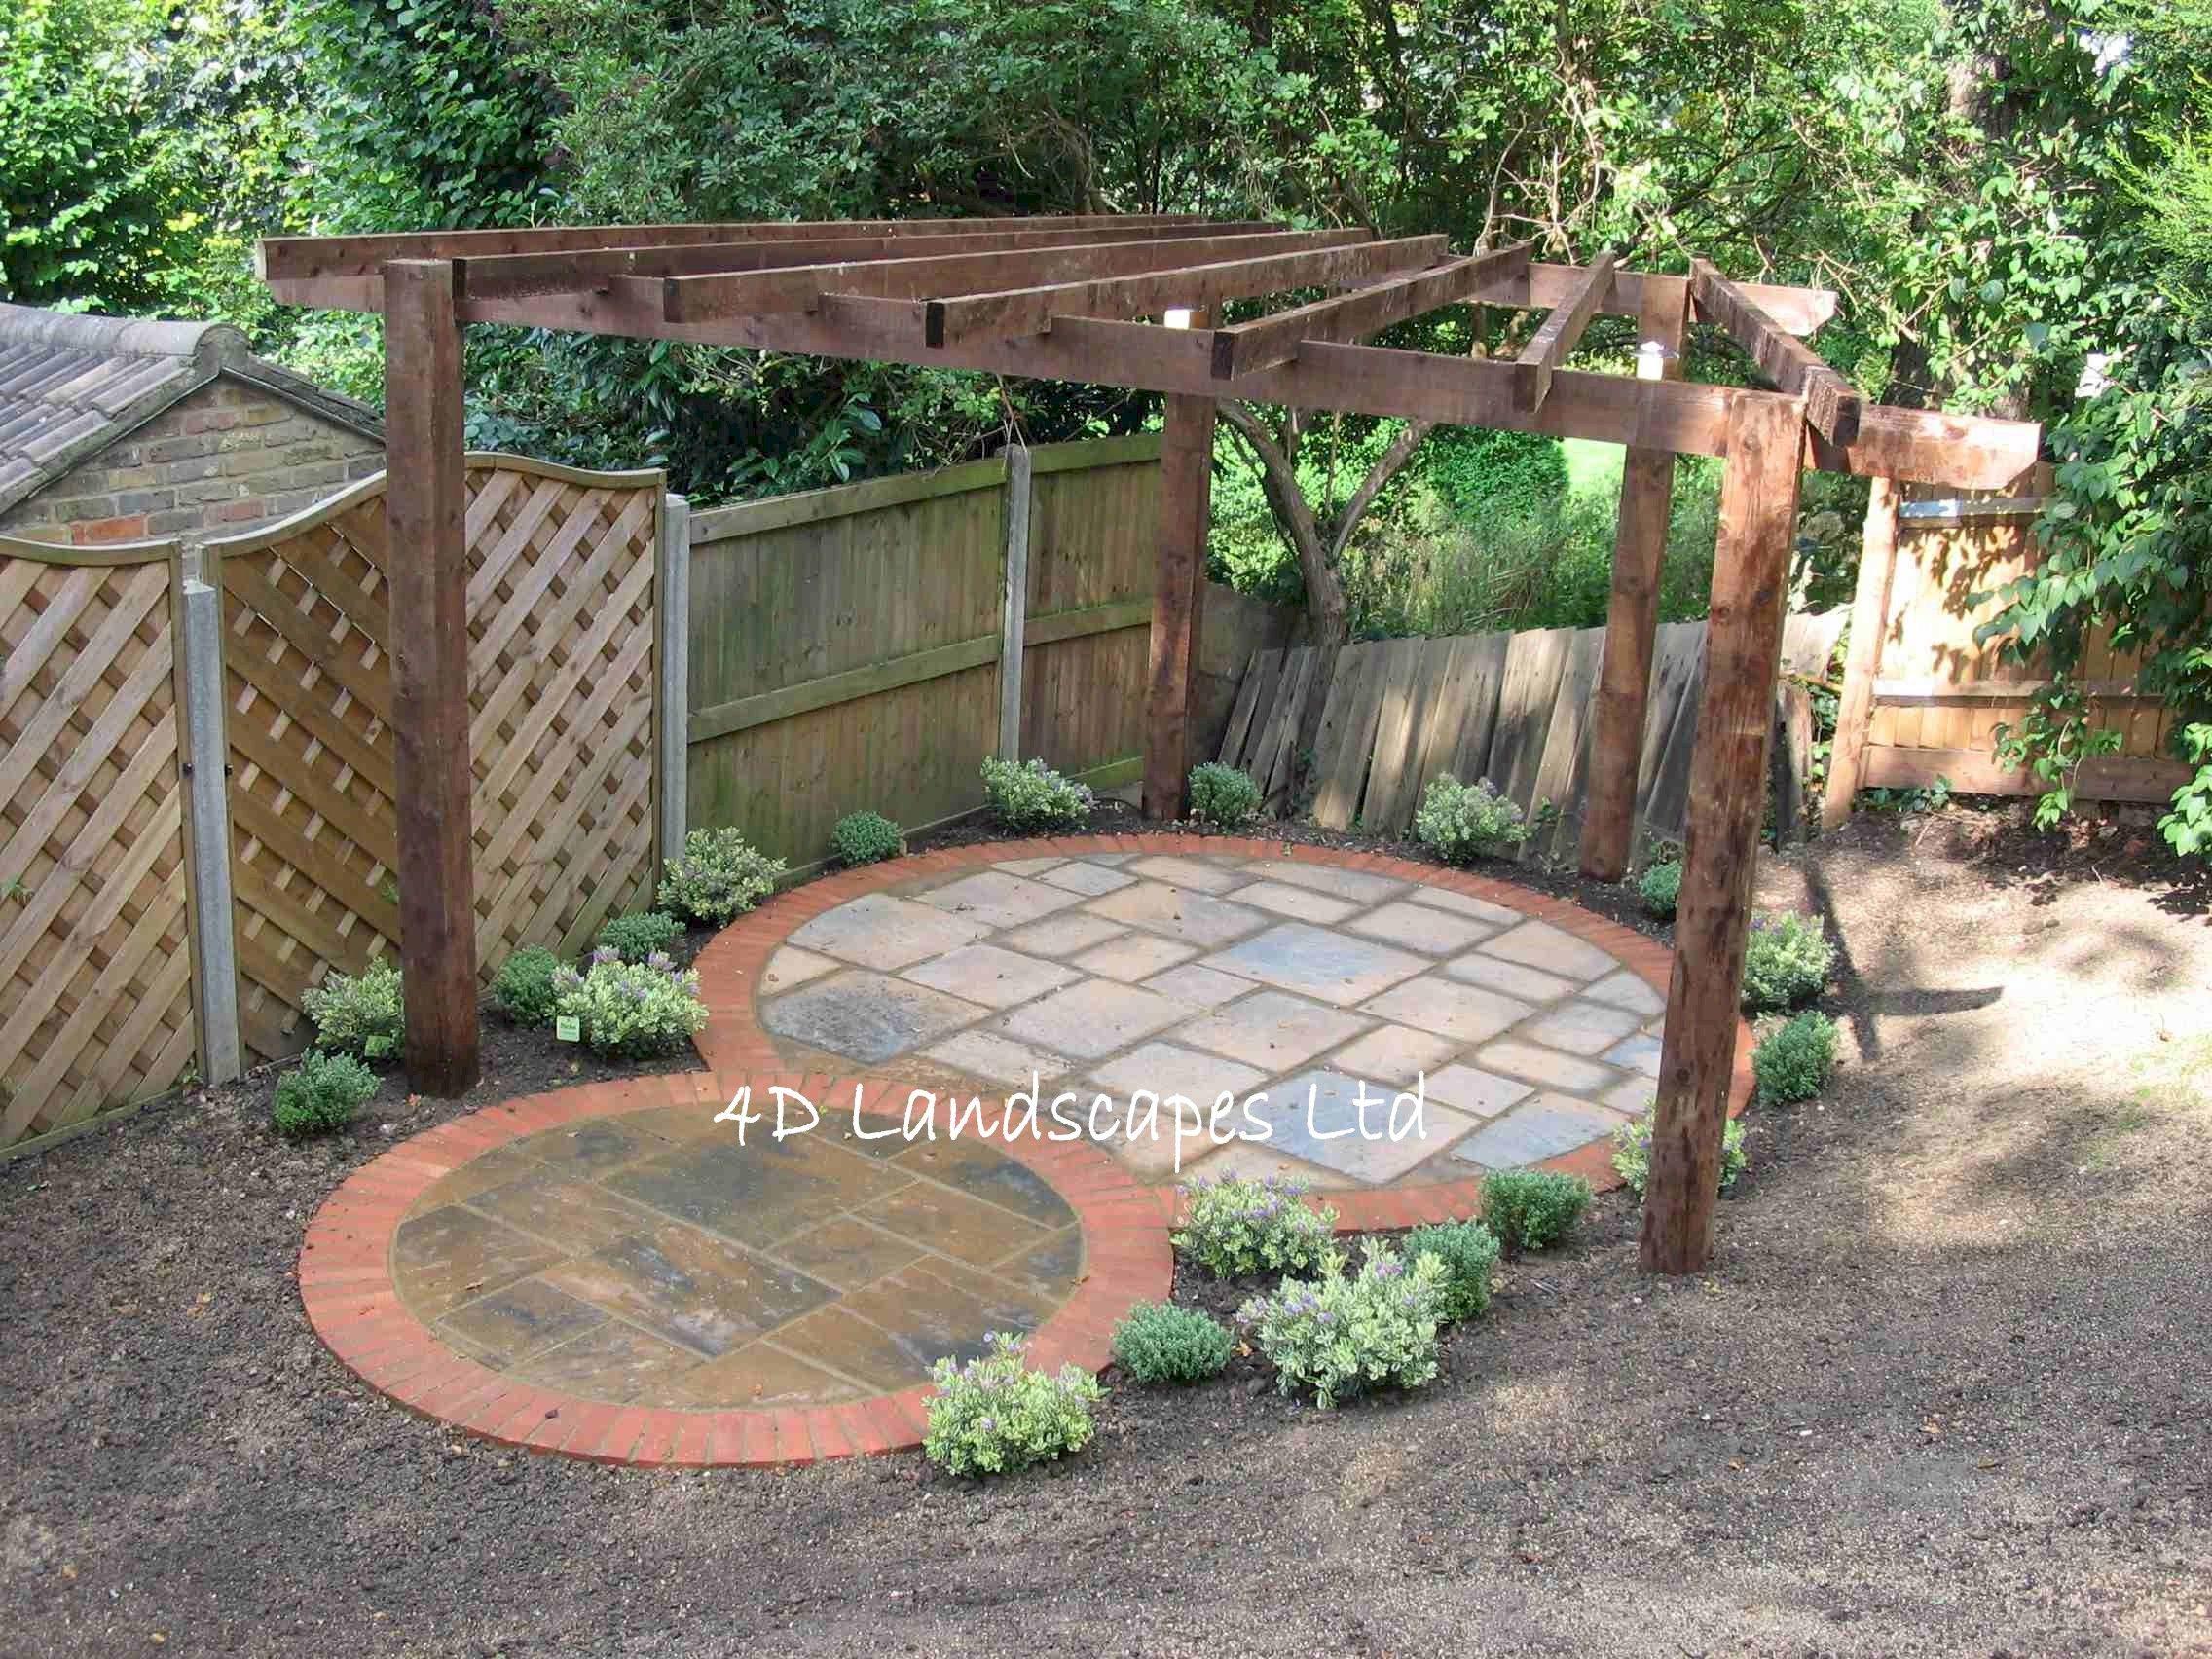 Gorgeous circular patio with pergola from 4d landscape ltd for 4d garden design